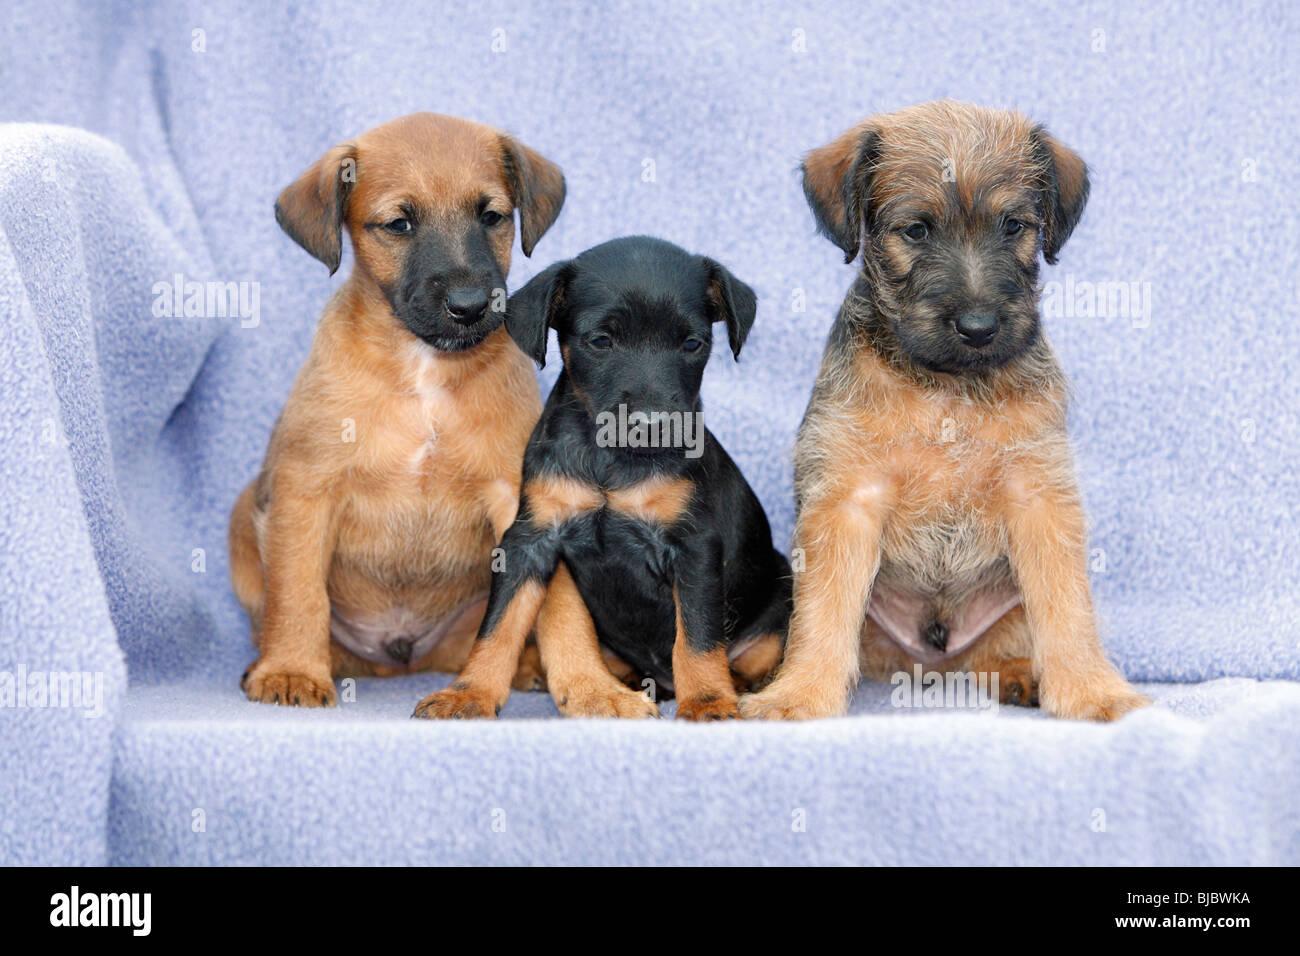 westfalia westfalen terrier puppy in stockfotos westfalia westfalen terrier puppy in bilder. Black Bedroom Furniture Sets. Home Design Ideas